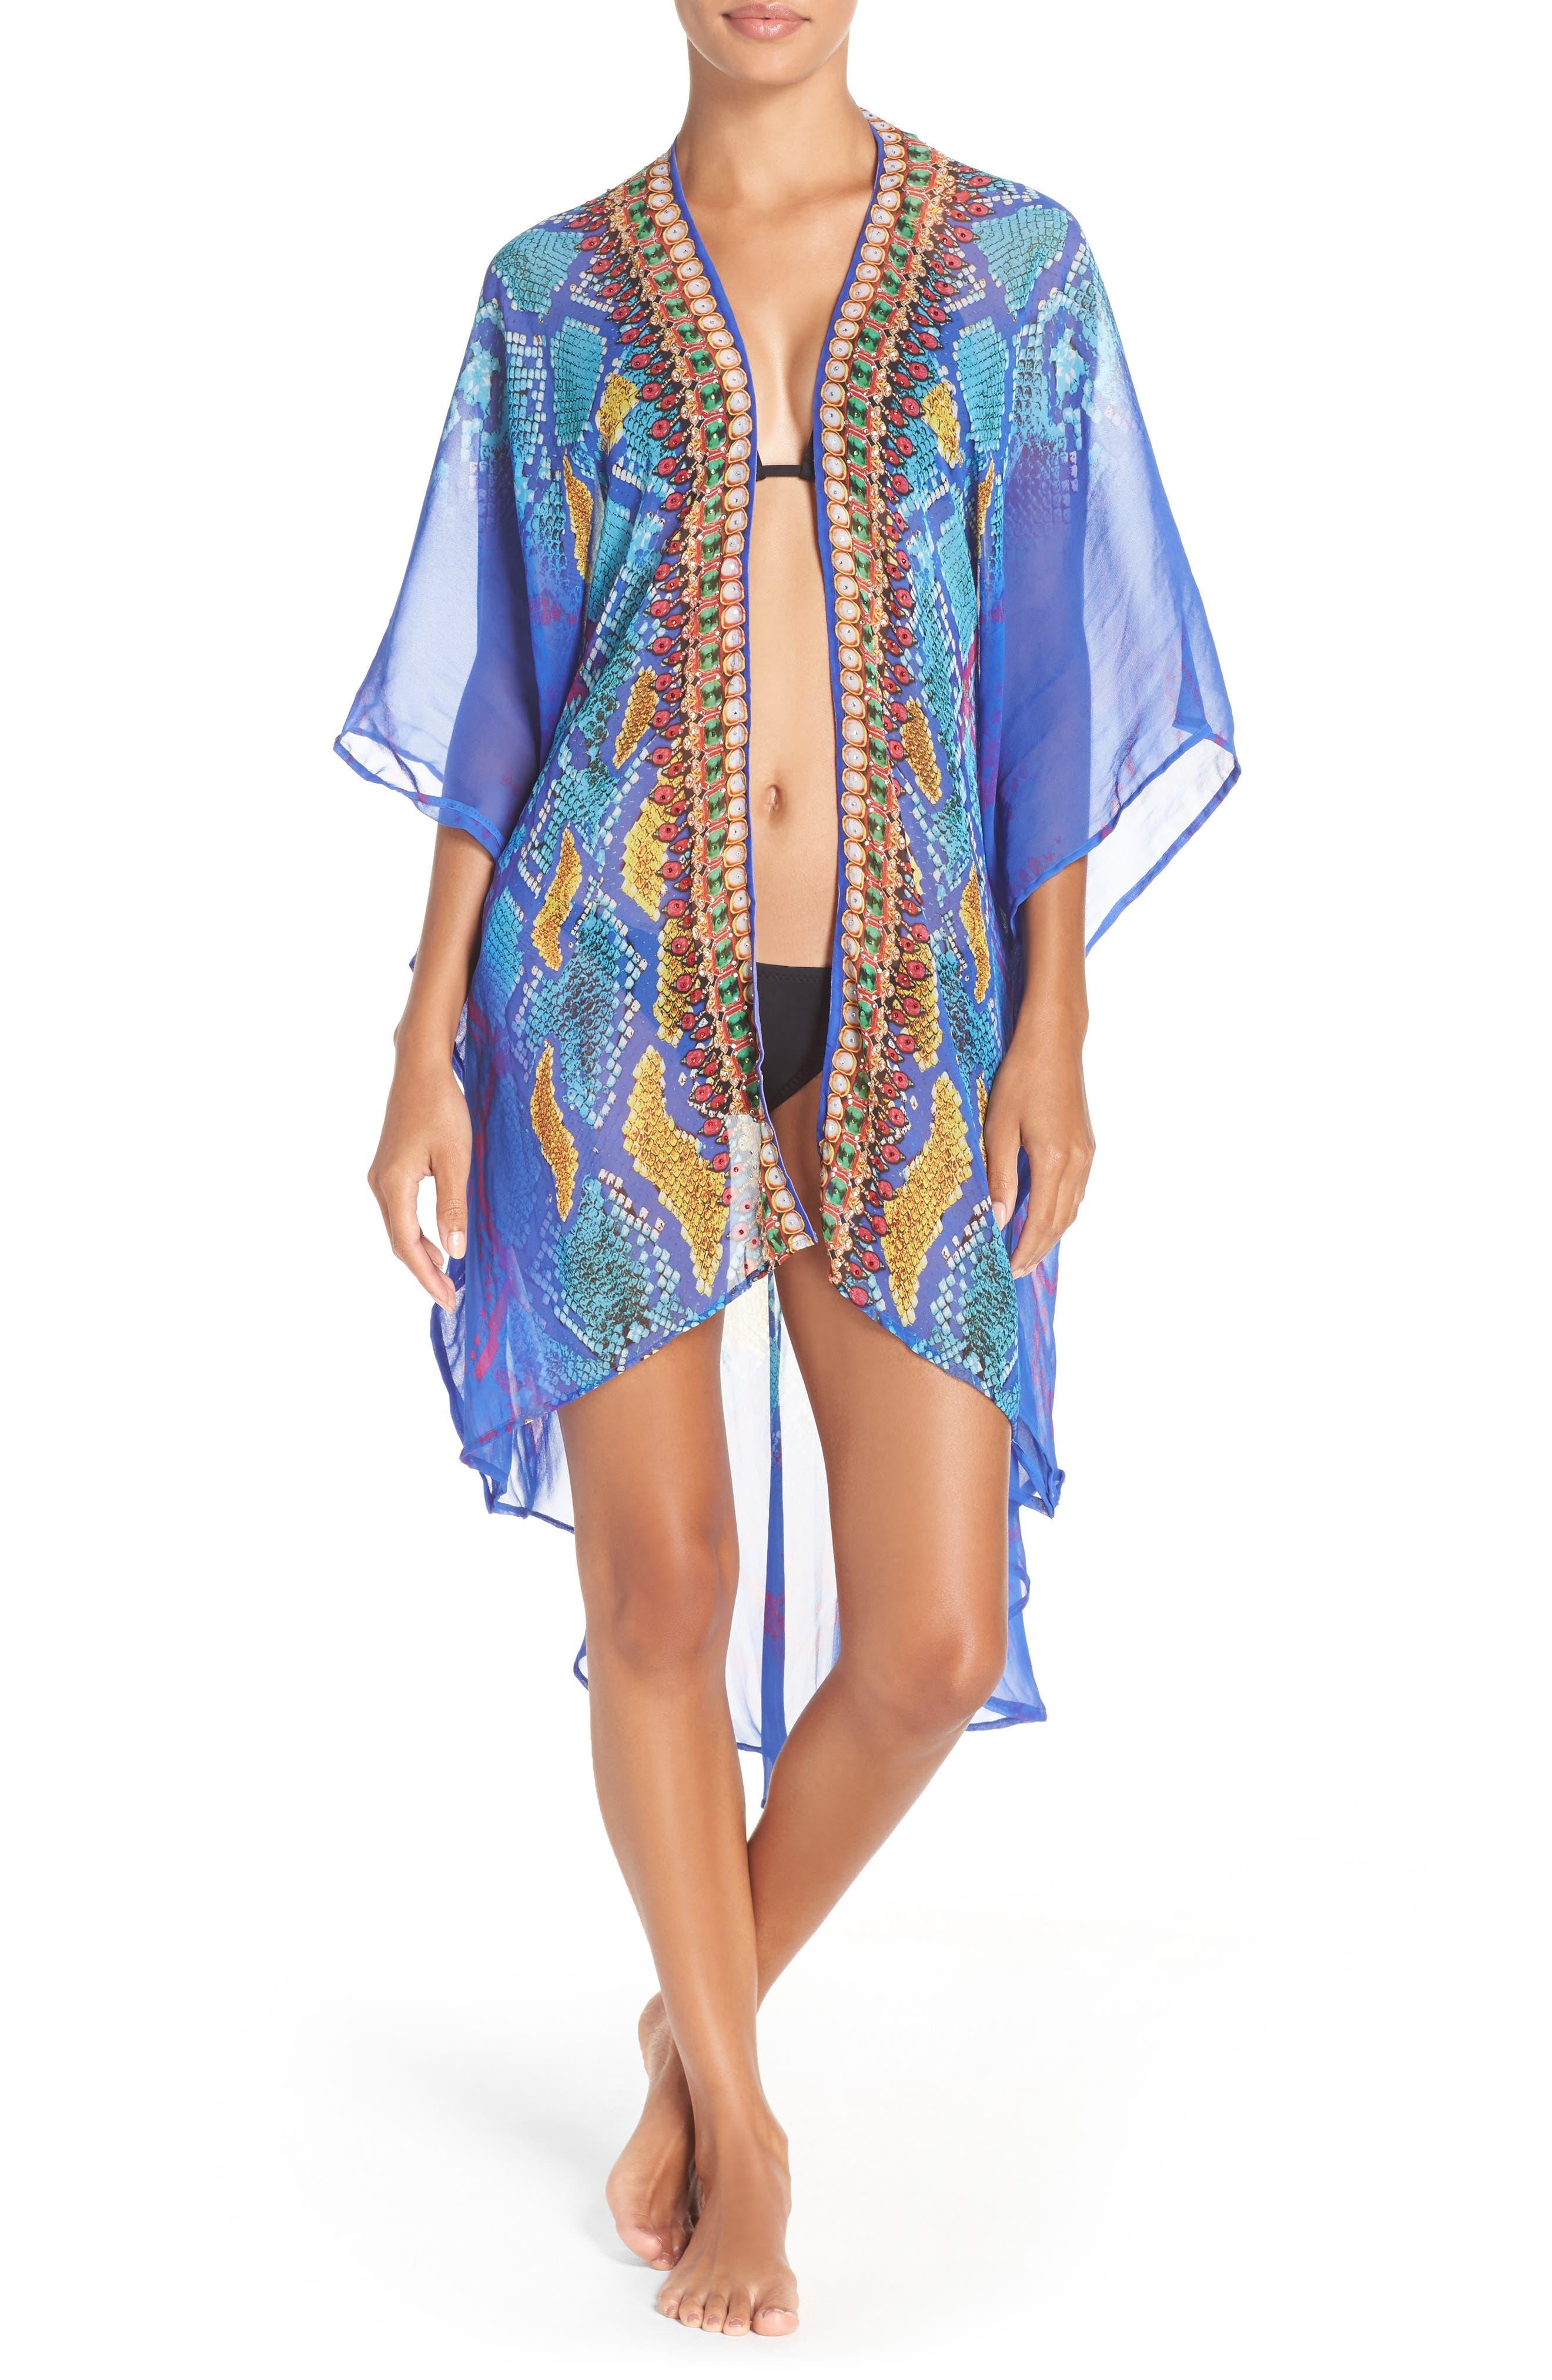 Main Image - Asa Kaftans 'Bahamas' Kimono